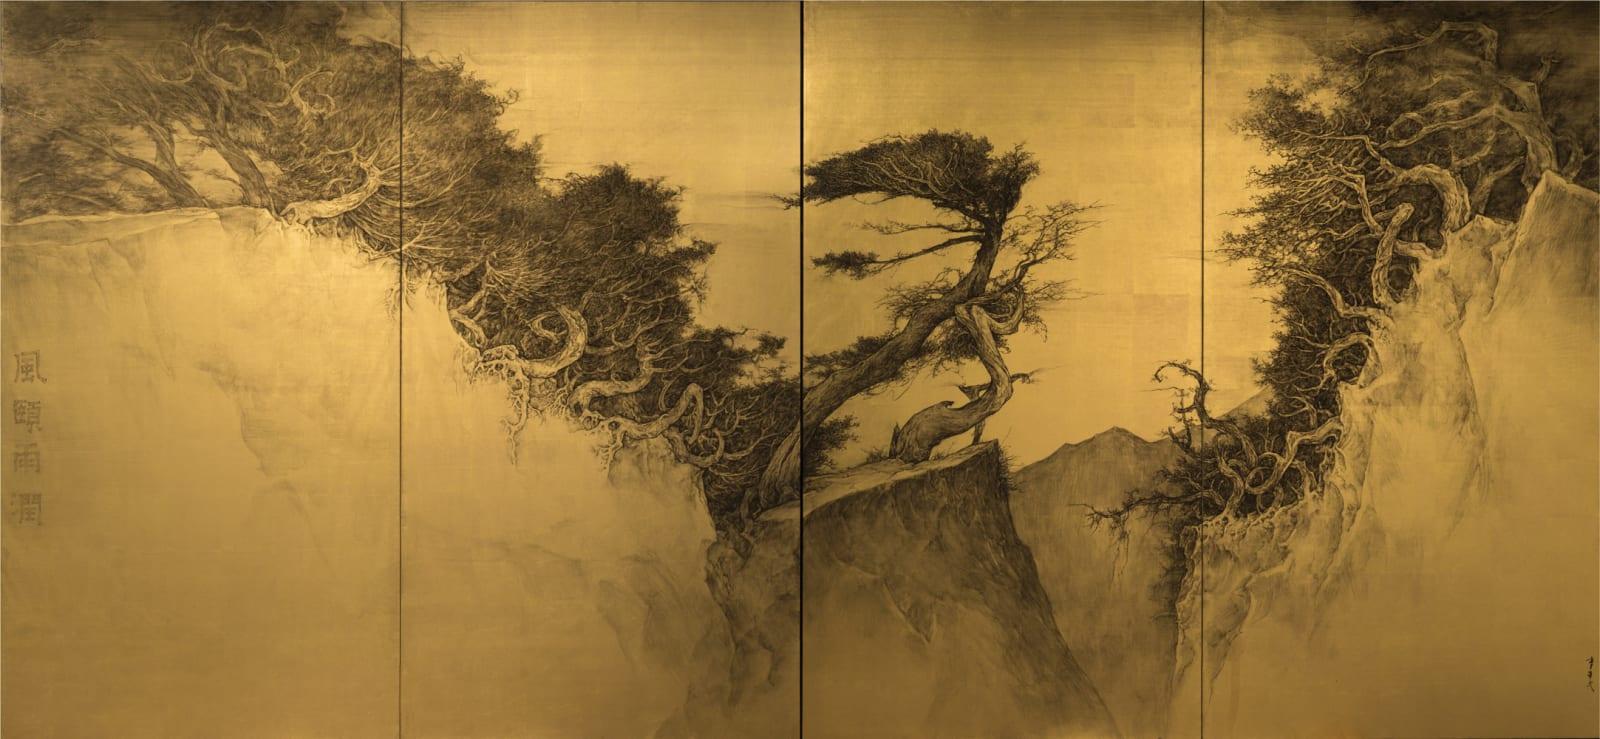 Li Huayi 李華弌, Enchanting Breeze and Nourishing Rain II 《風頤雨潤 (二)》, 2016